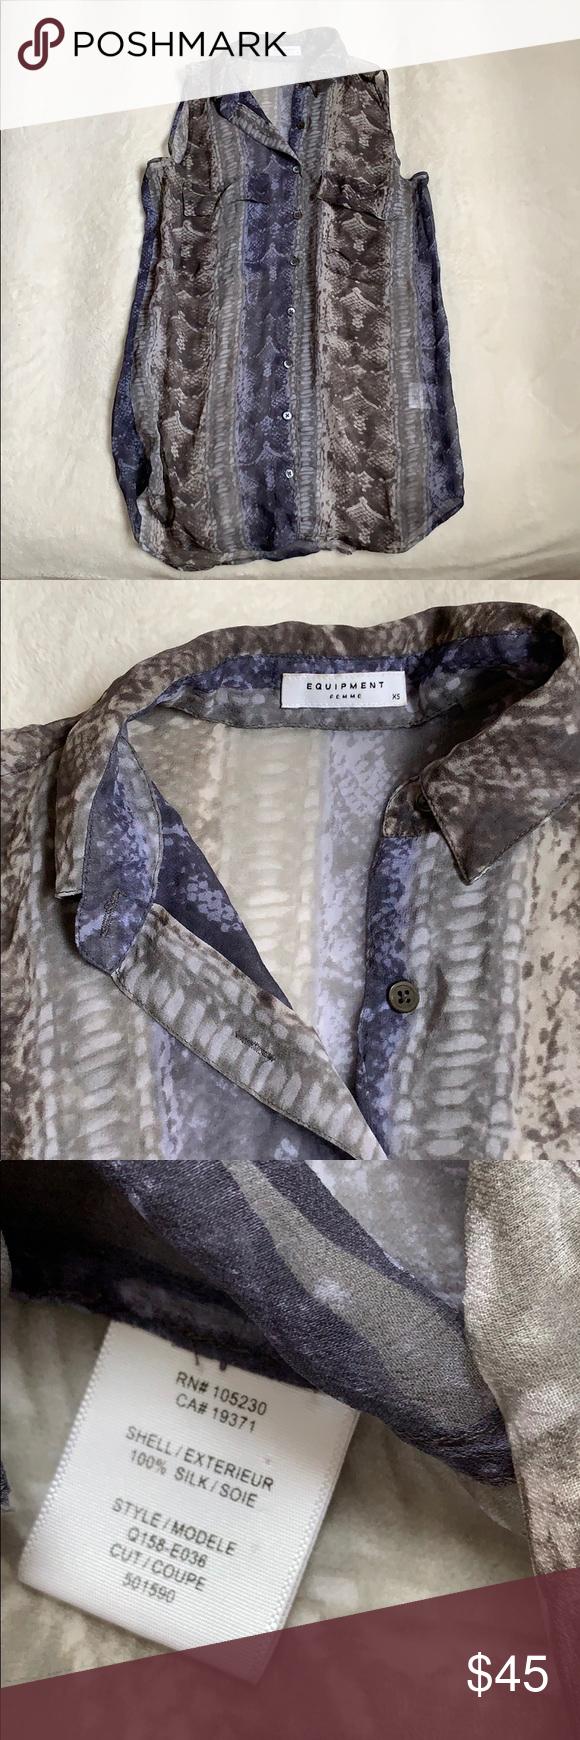 26471e8ea591 Equipment sleeveless snake print blouse Equipment sleeveless 100% silk  button down blouse, snake print